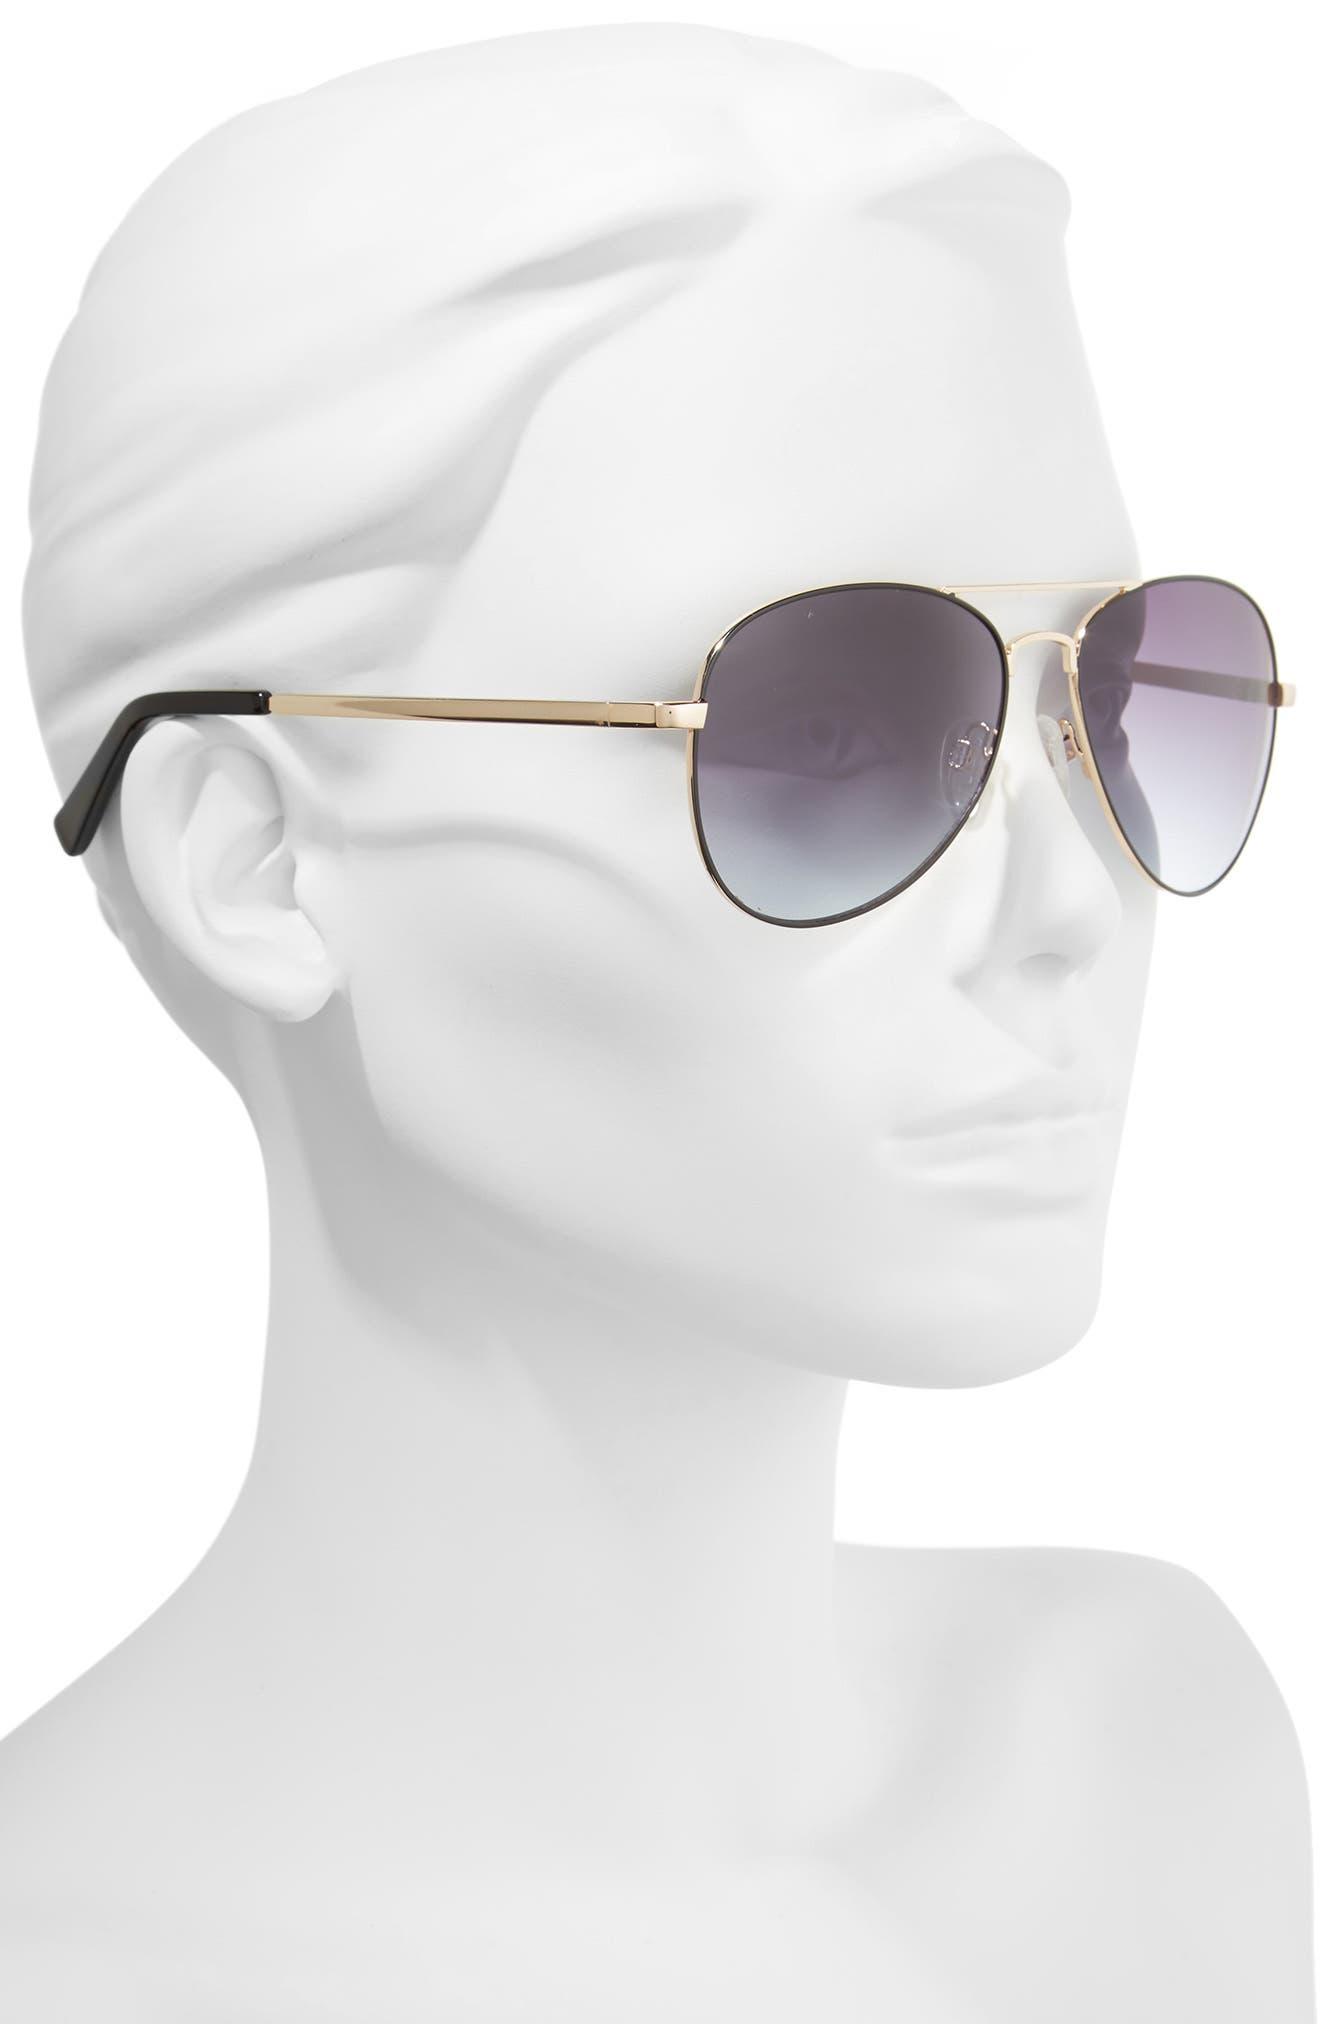 Alibi 59mm Metal Aviator Sunglasses,                             Alternate thumbnail 2, color,                             Gold- Black Epoxy